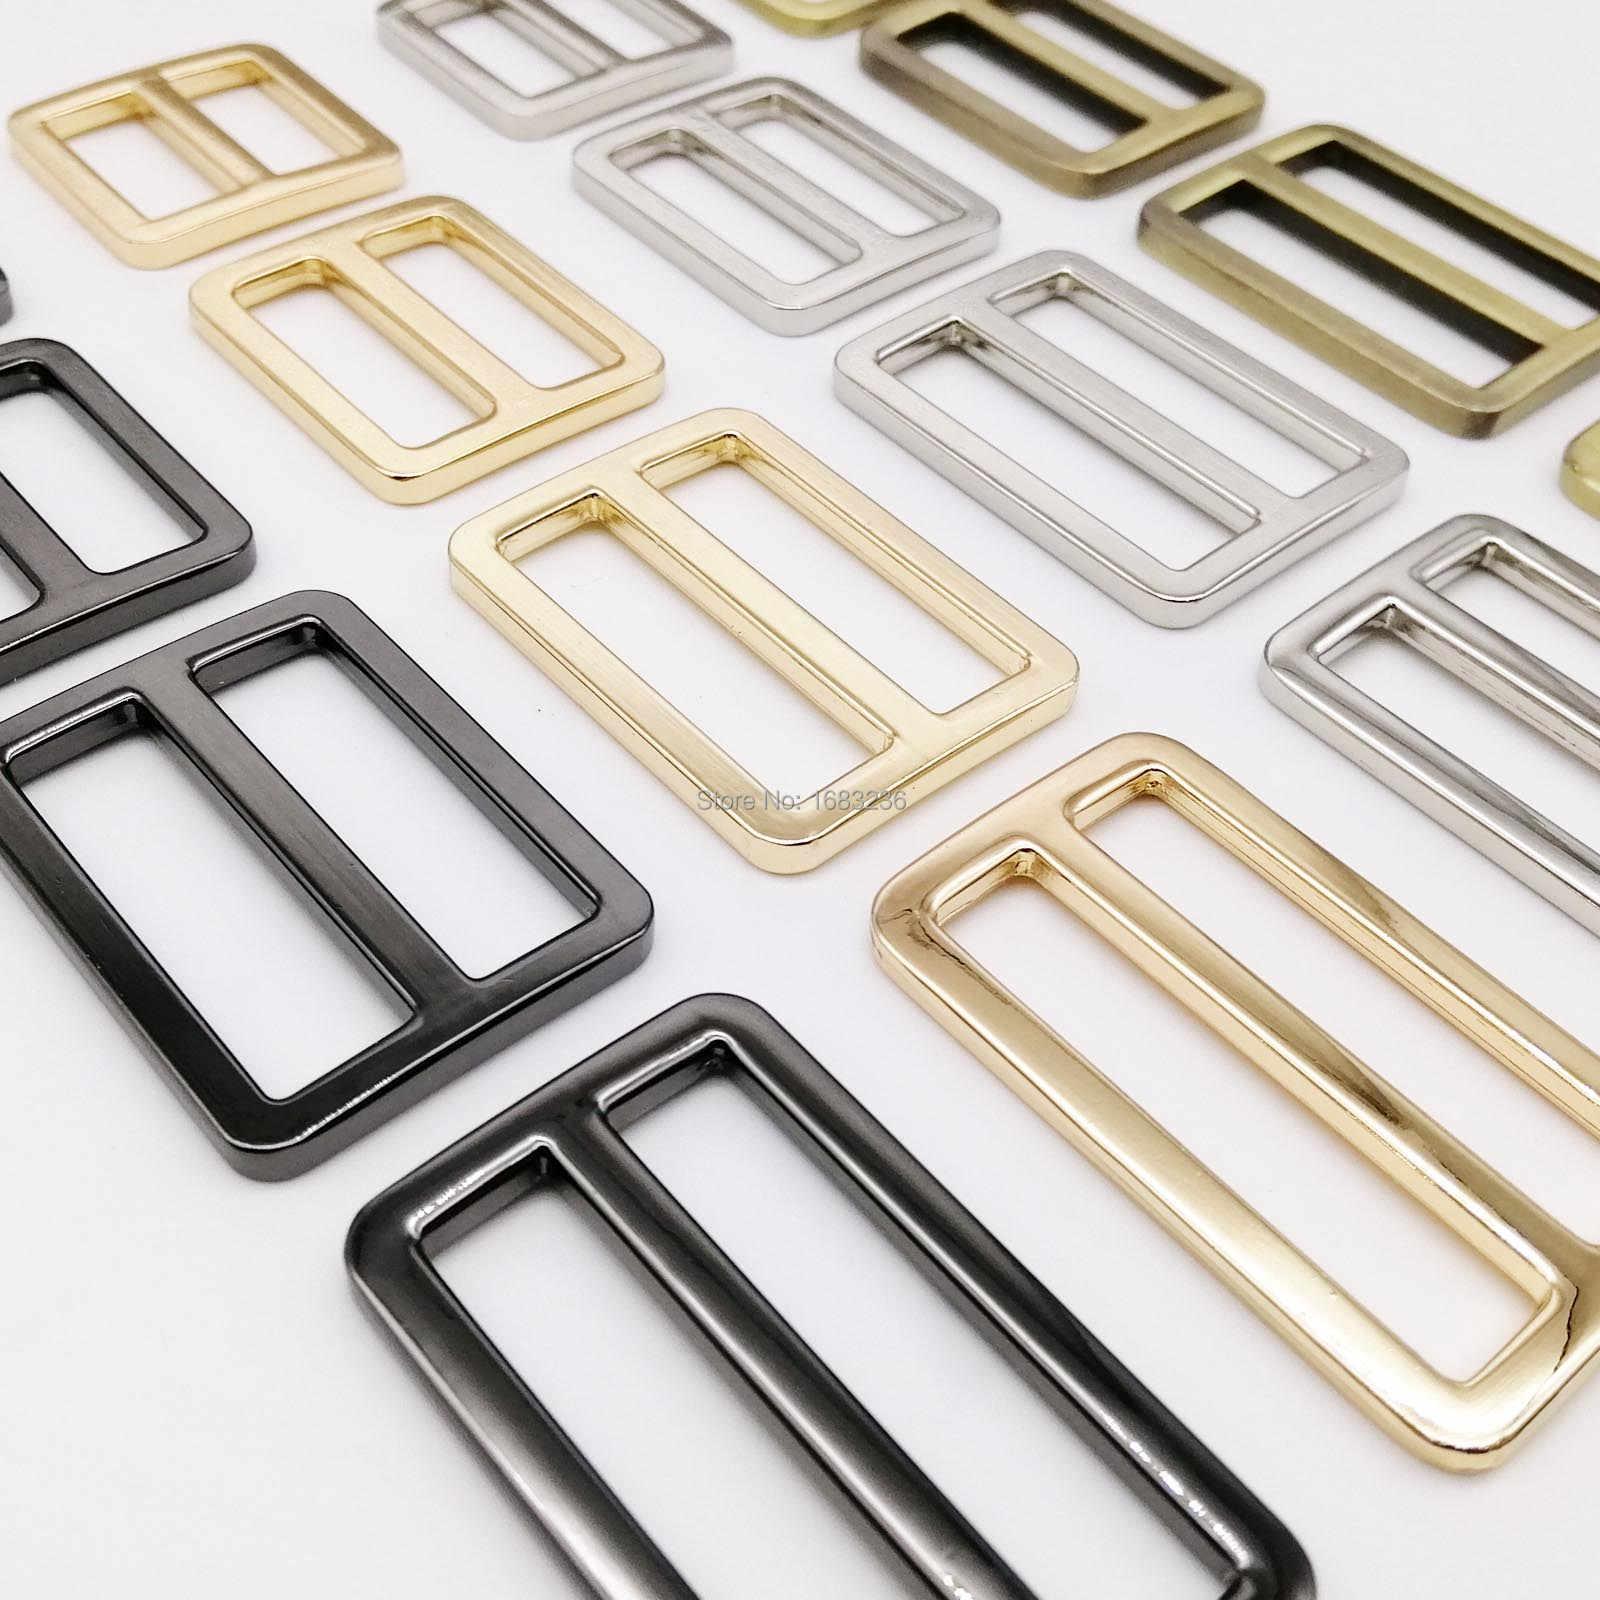 DIY โลหะ Heavy Duty ความหนาหนังกระเป๋าเข็มขัด Web สี่เหลี่ยมผืนผ้าปรับ Tri-Glide หัวเข็มขัด Slider LOOP O D แหวน